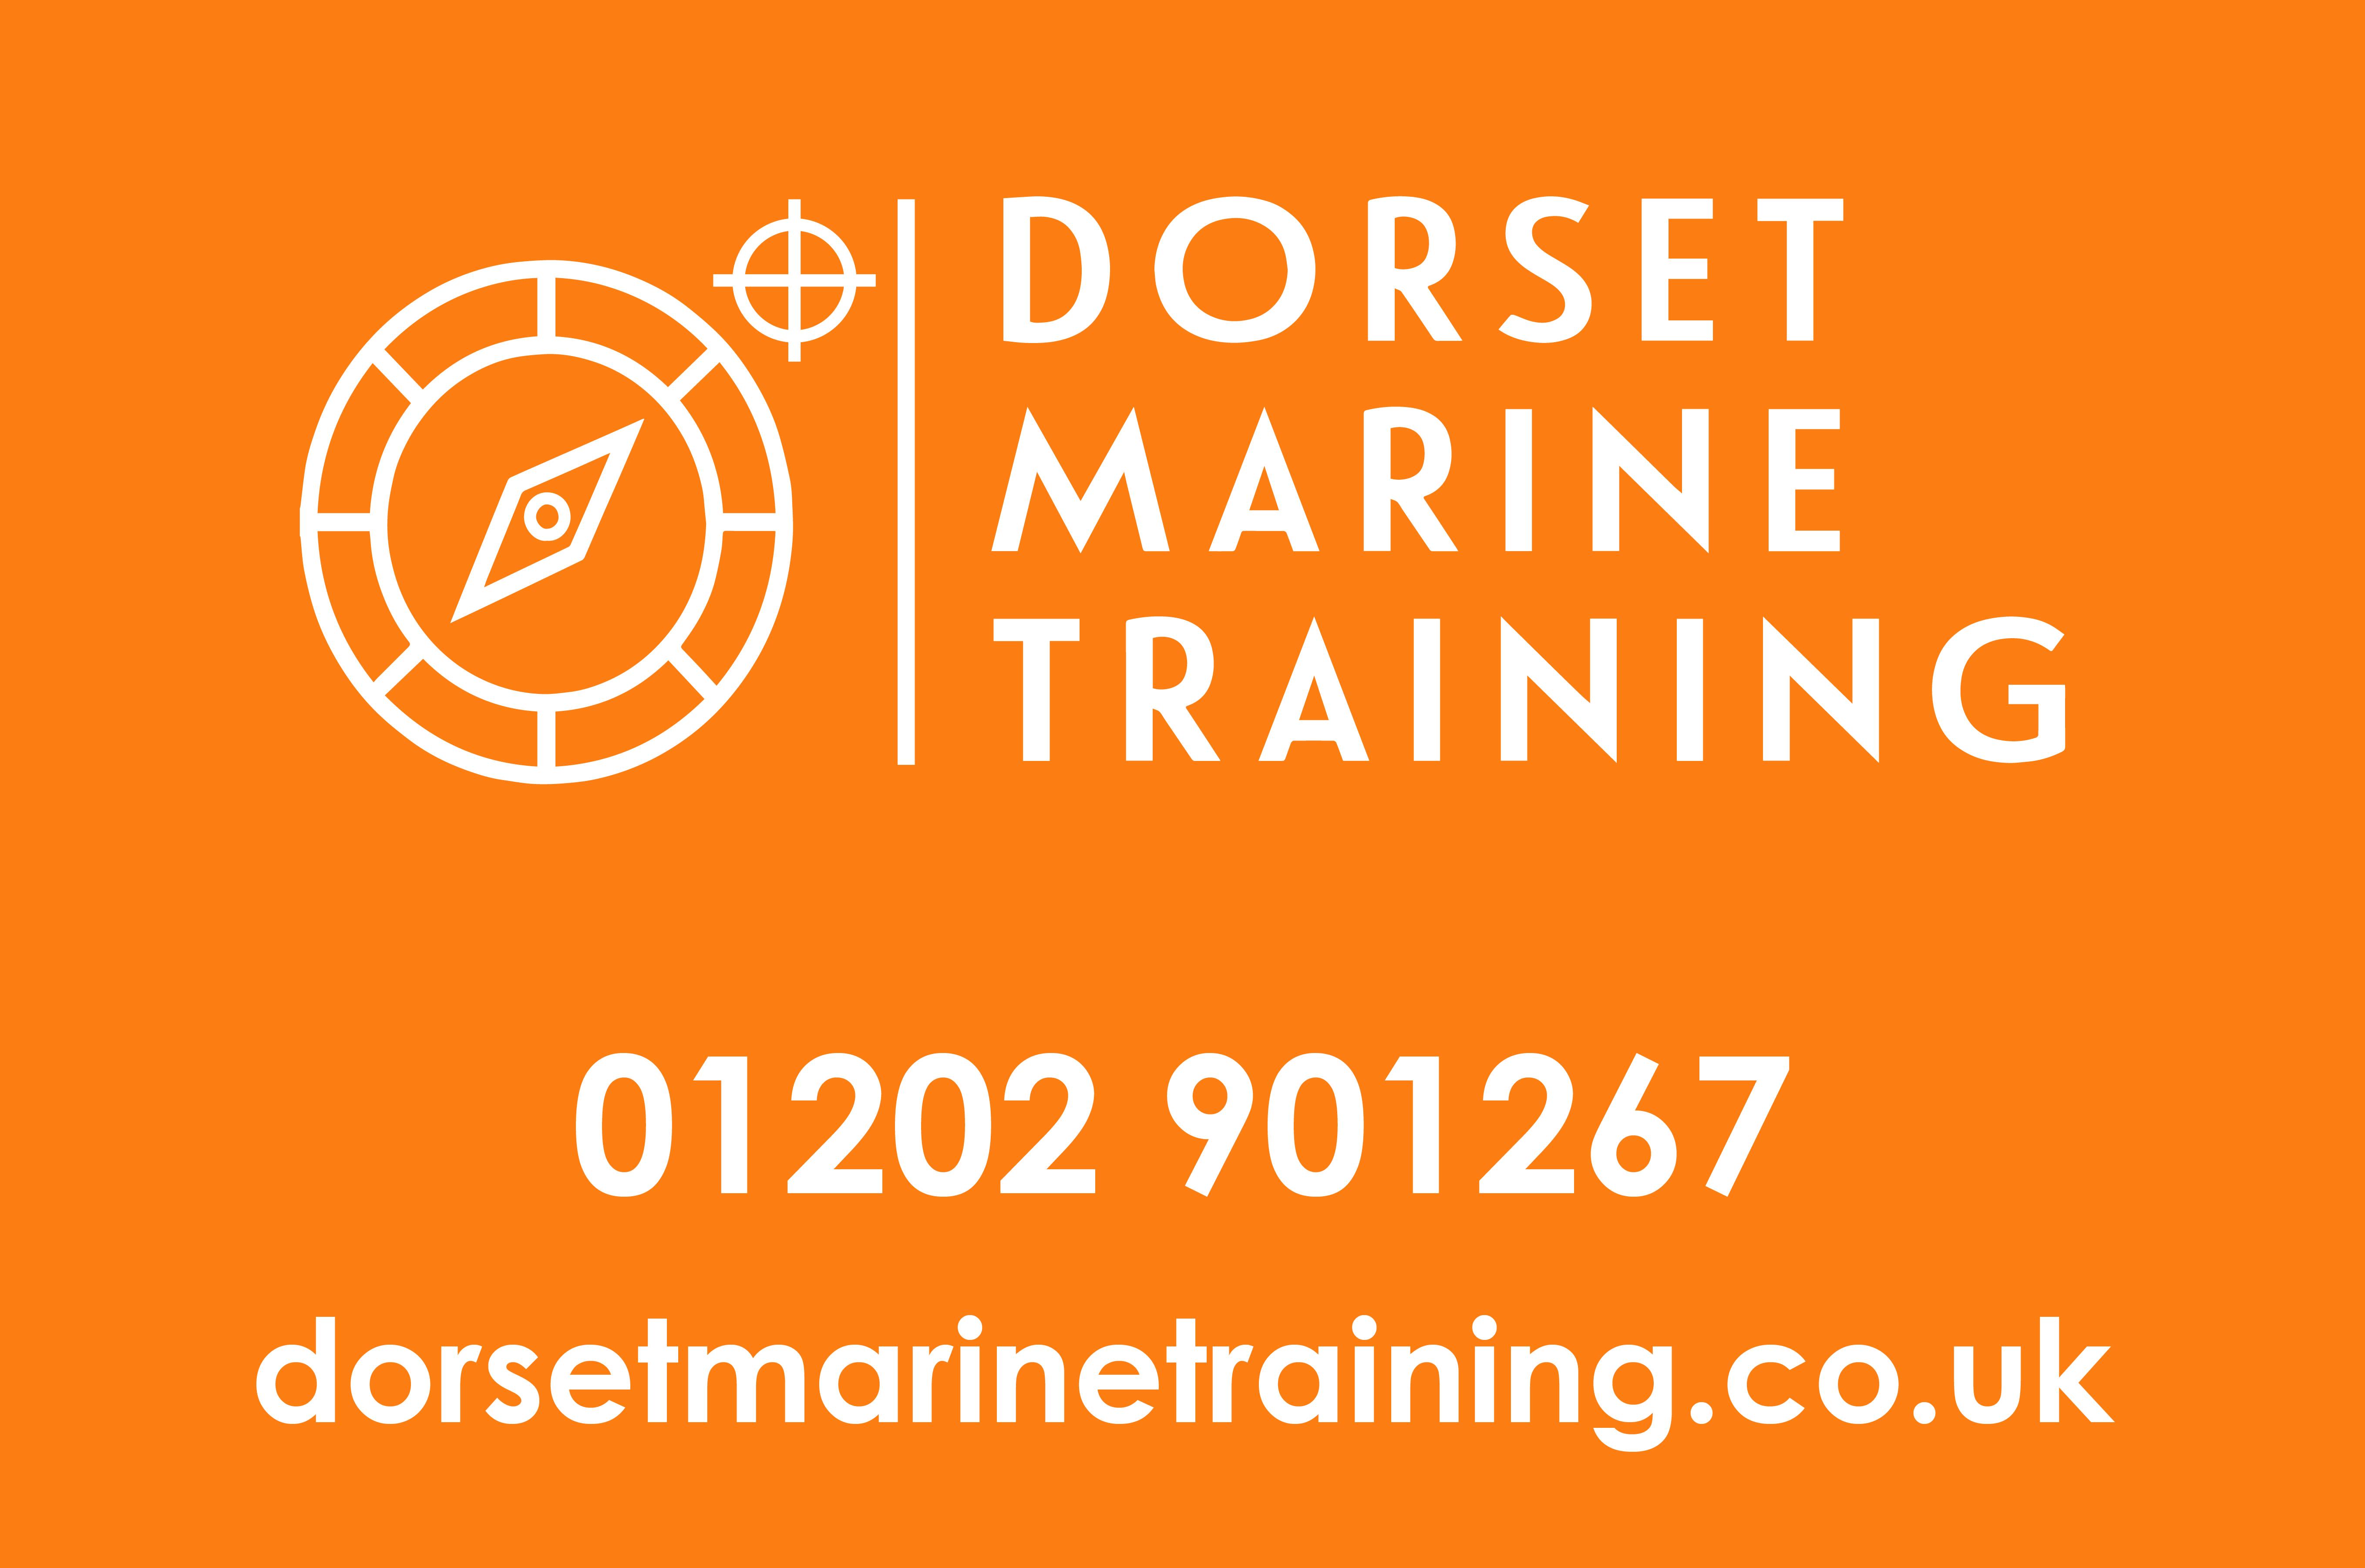 Dorset Marine Training logo